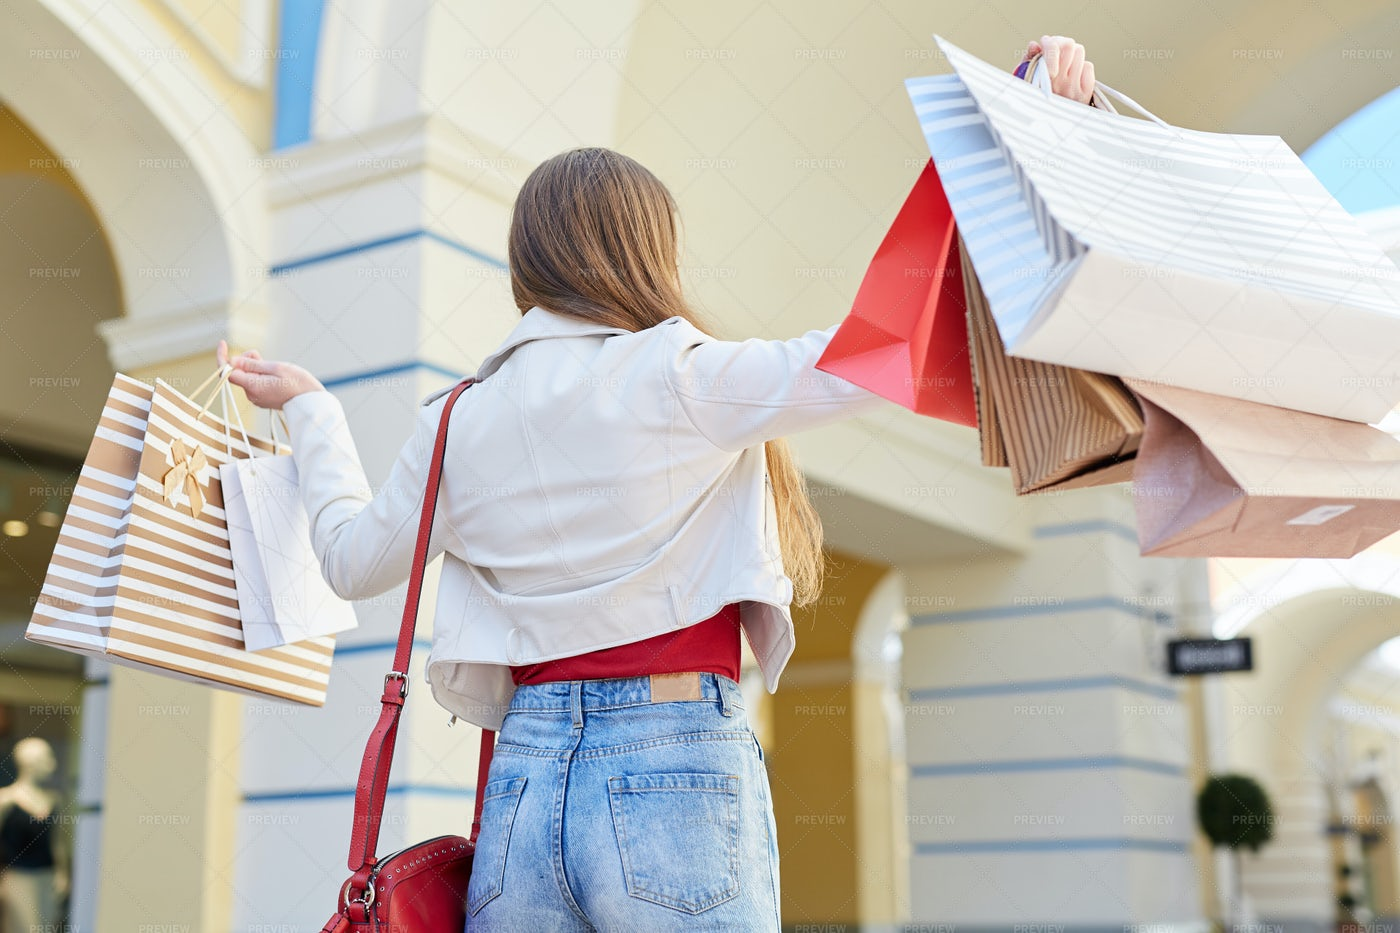 Starting Shopping Tour: Stock Photos